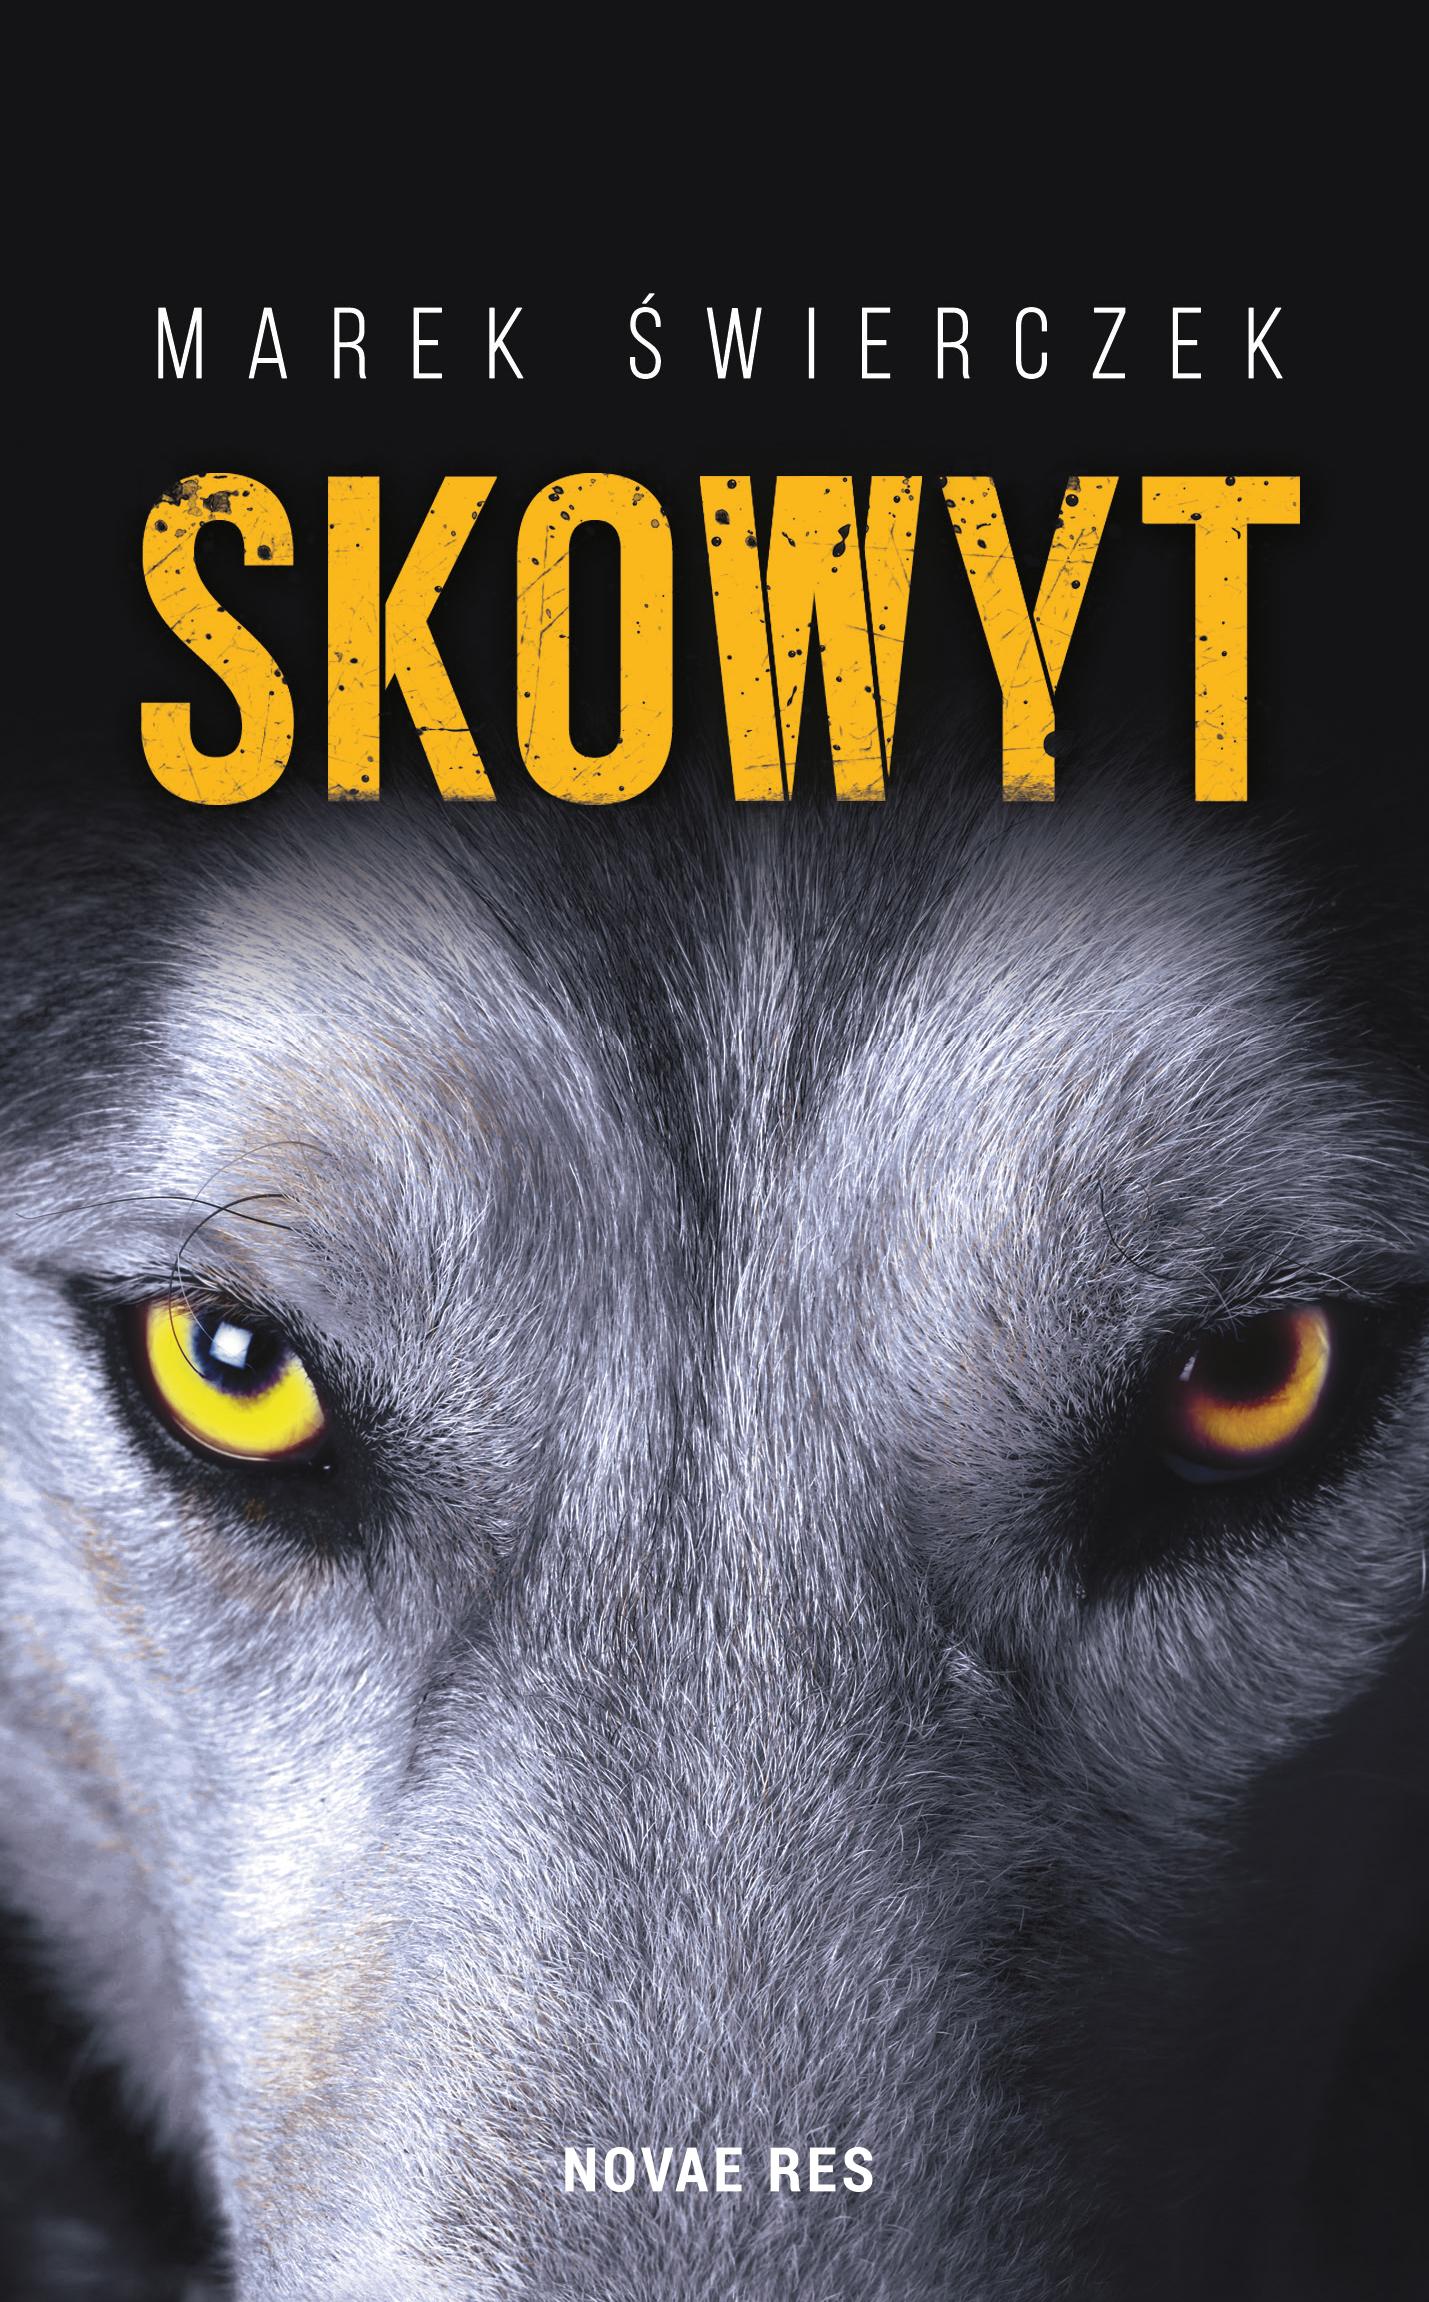 skowyt_okl